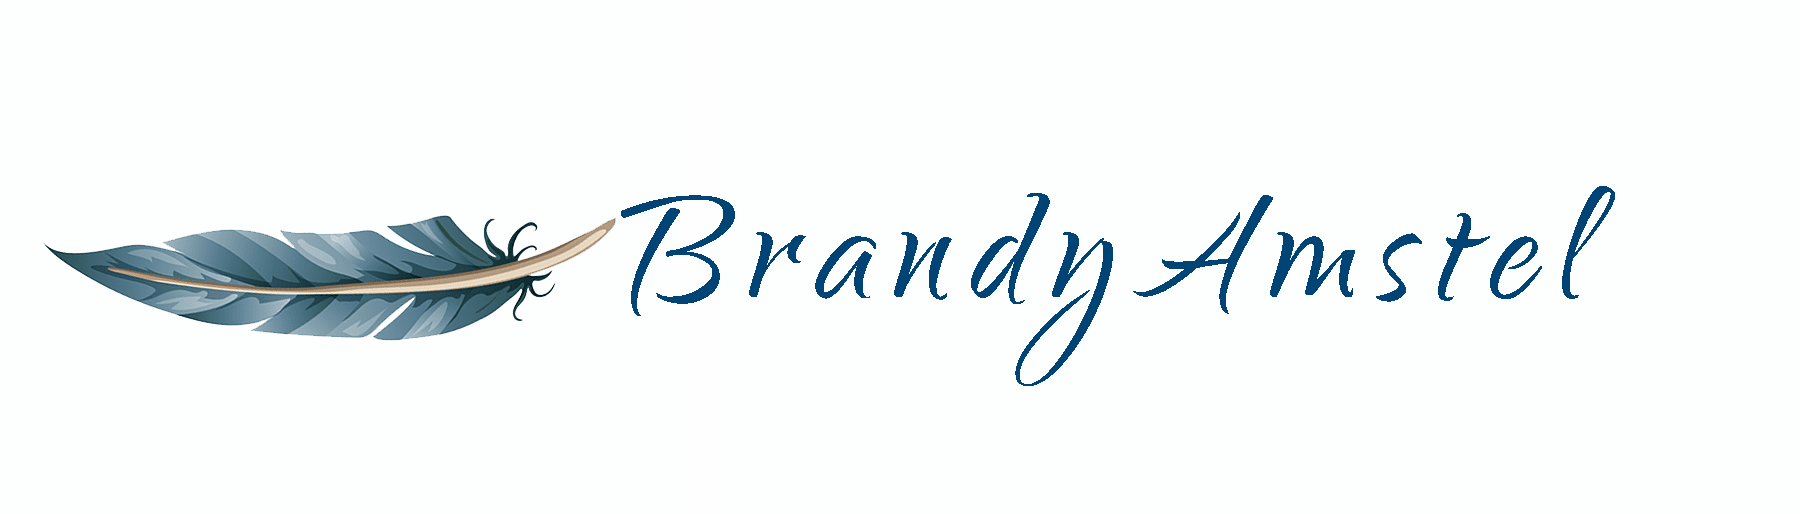 Brandy Amstel